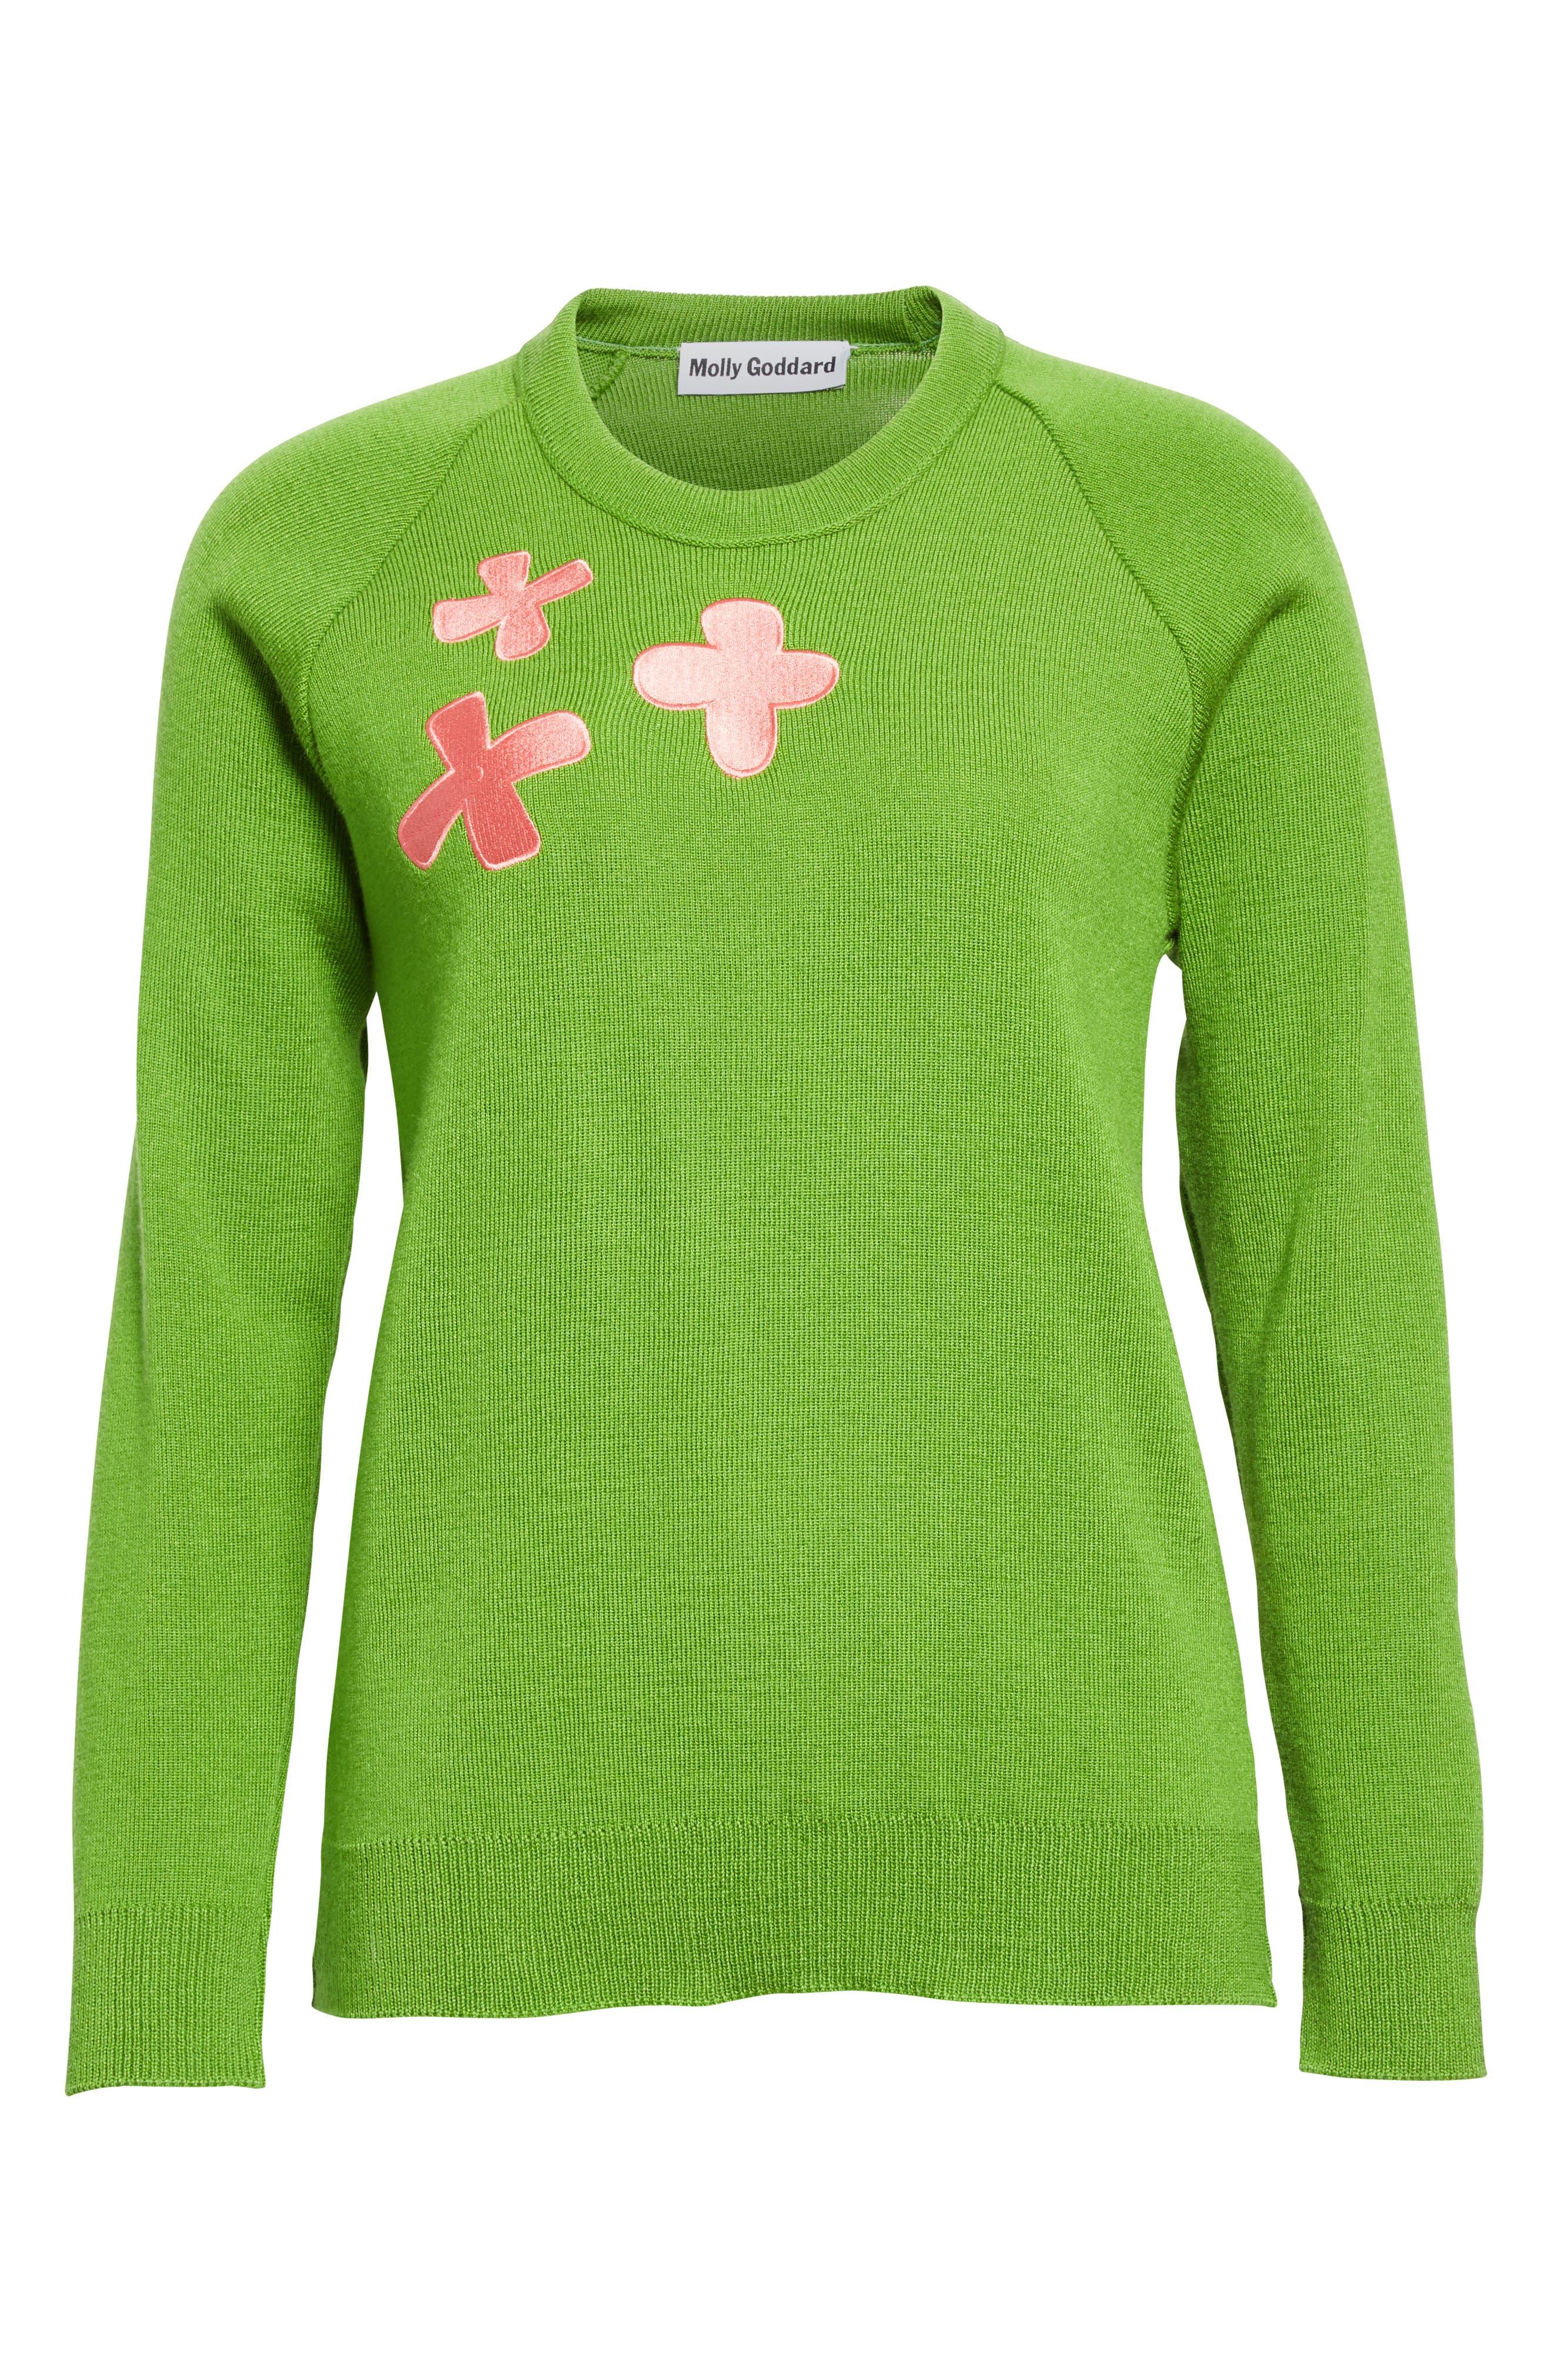 Alternate Image 4  - Molly Goddard Charlie Sweater